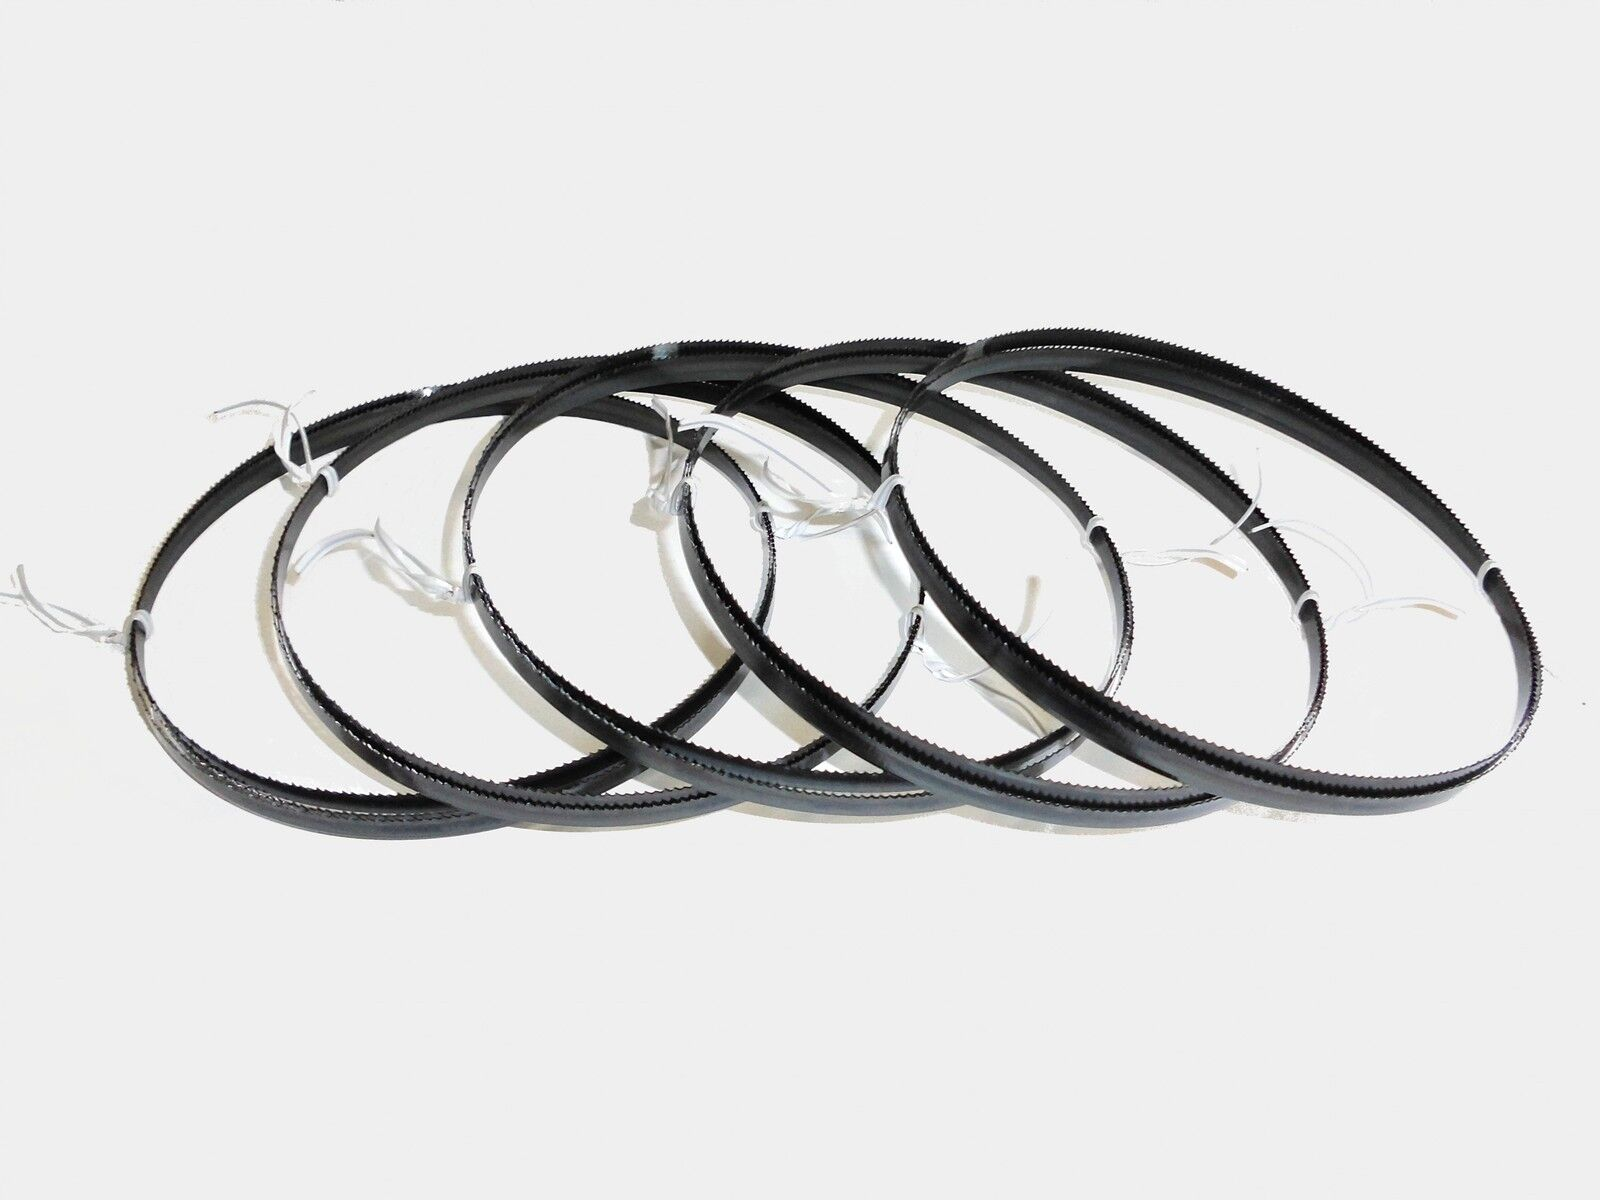 5 X Sägebänder Sägeband 1400 X 6 X 0,65 Mm 14 Zpz Metall Profile Atika Einhell